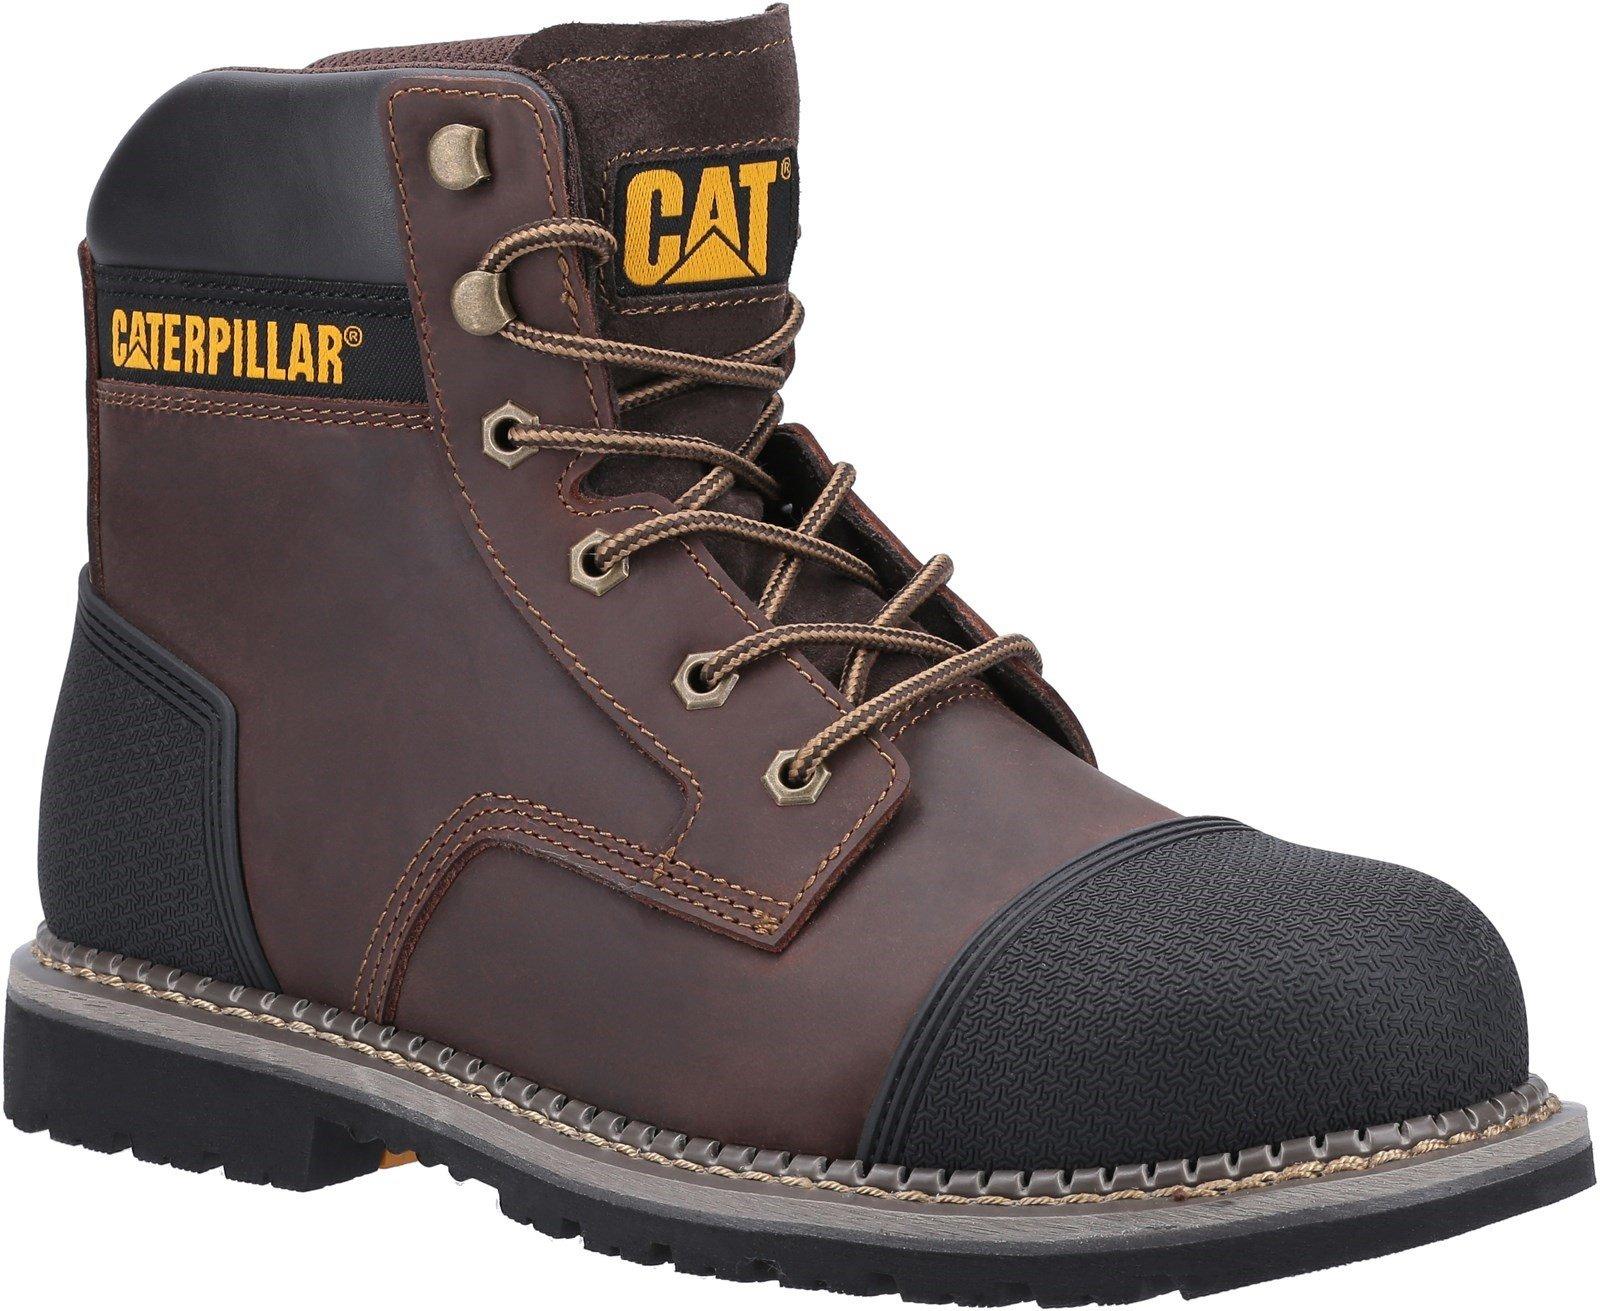 Caterpillar Unisex Powerplant S3 Safety Boot Brown 31903 - Brown 6